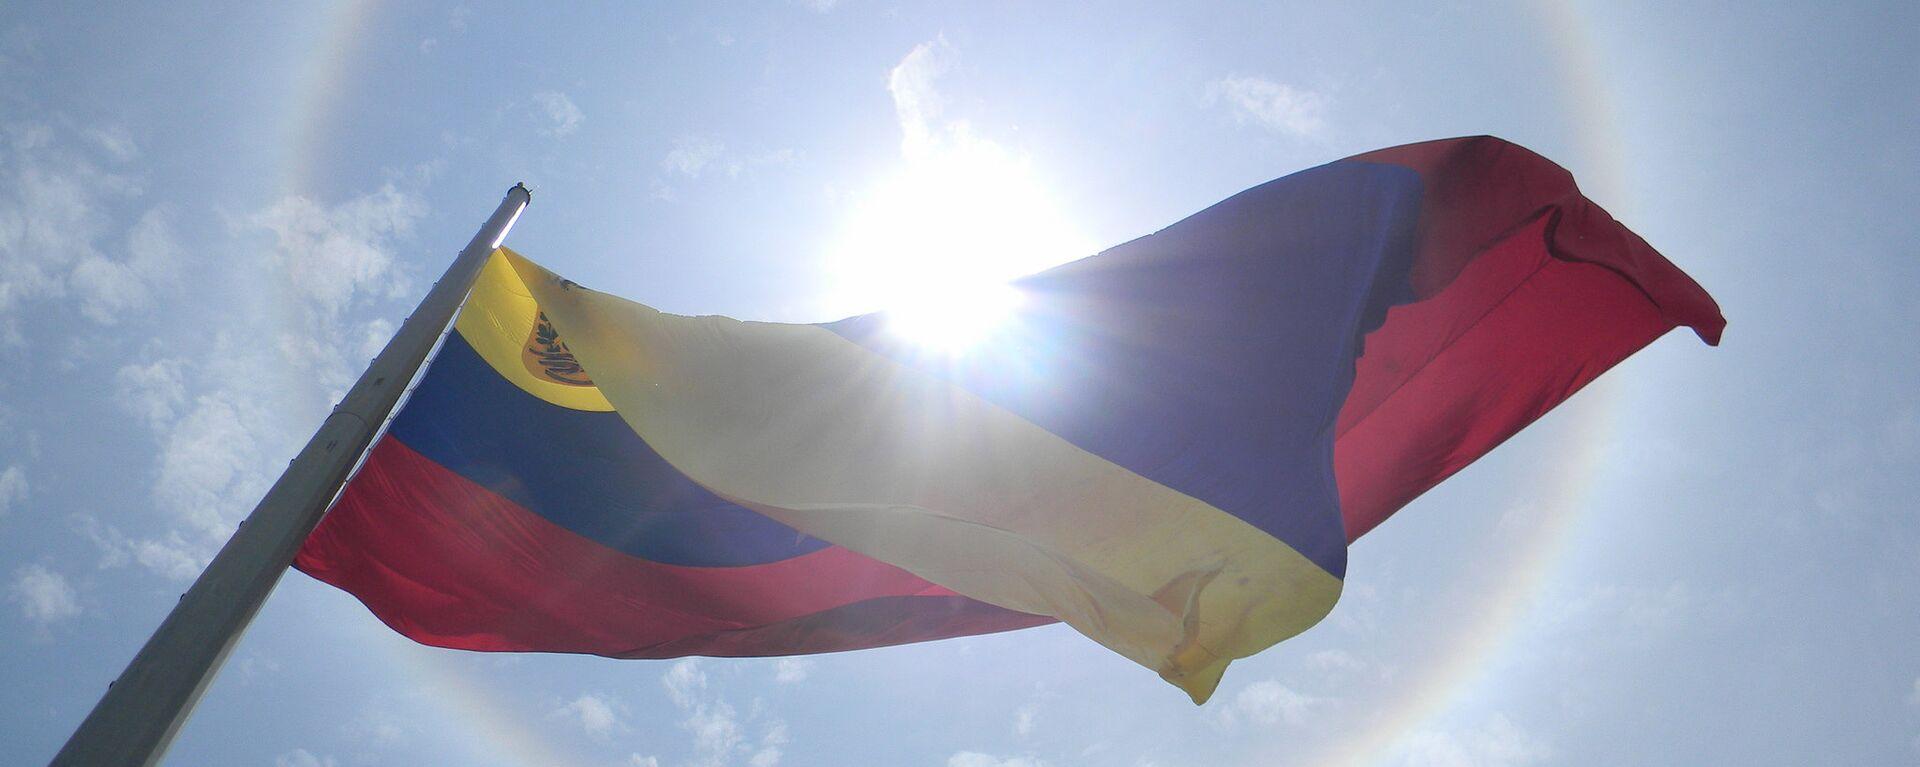 Bandera de Venezuela - Sputnik Mundo, 1920, 26.06.2020